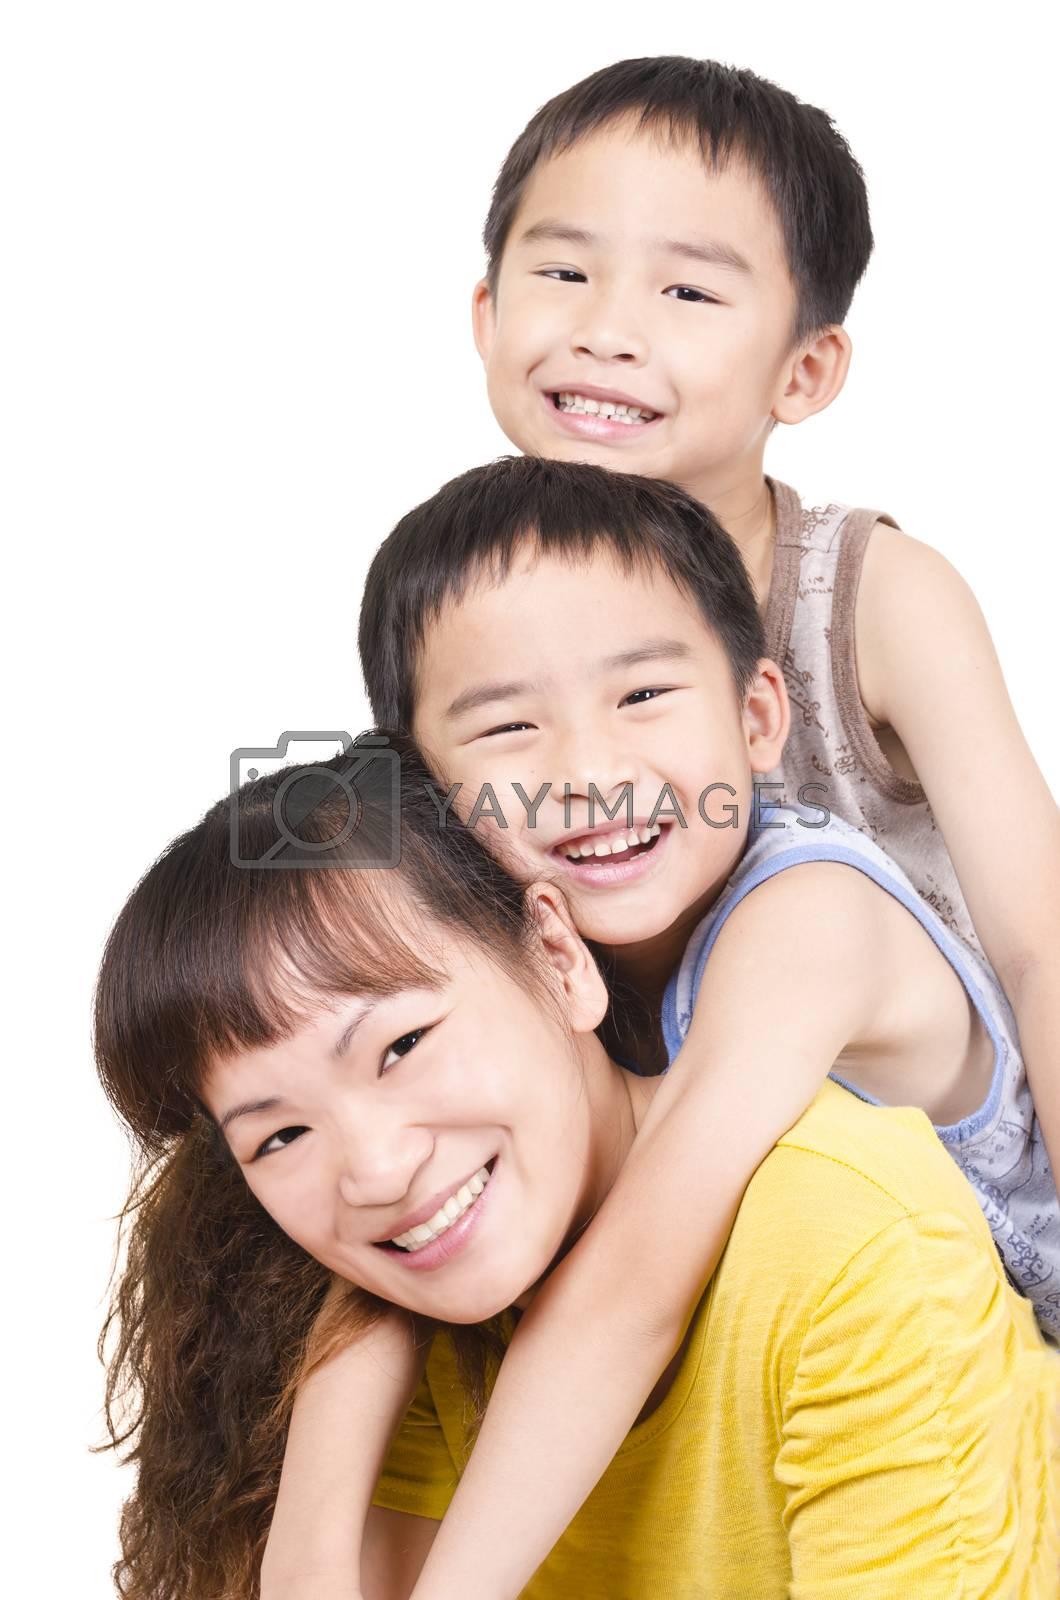 Royalty free image of Happy family portrait by FrankyLiu